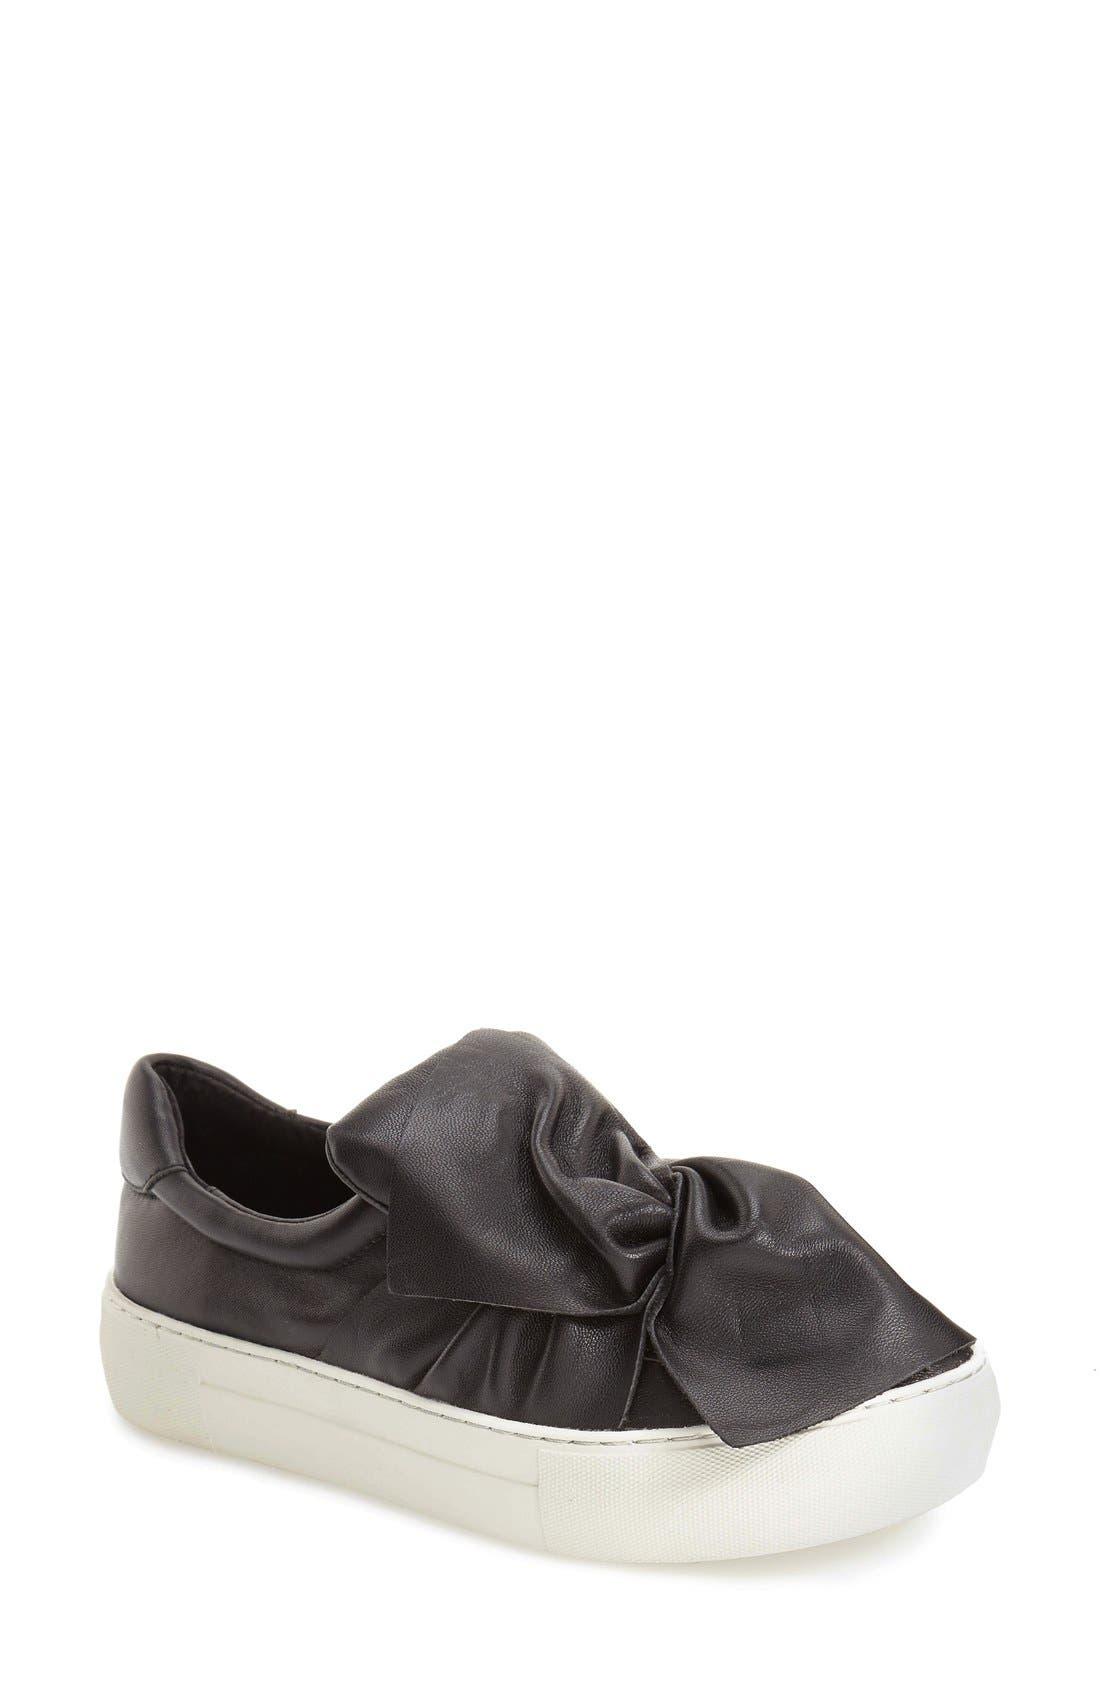 Main Image - JSlides 'Annabelle' Platform Sneaker (Women)